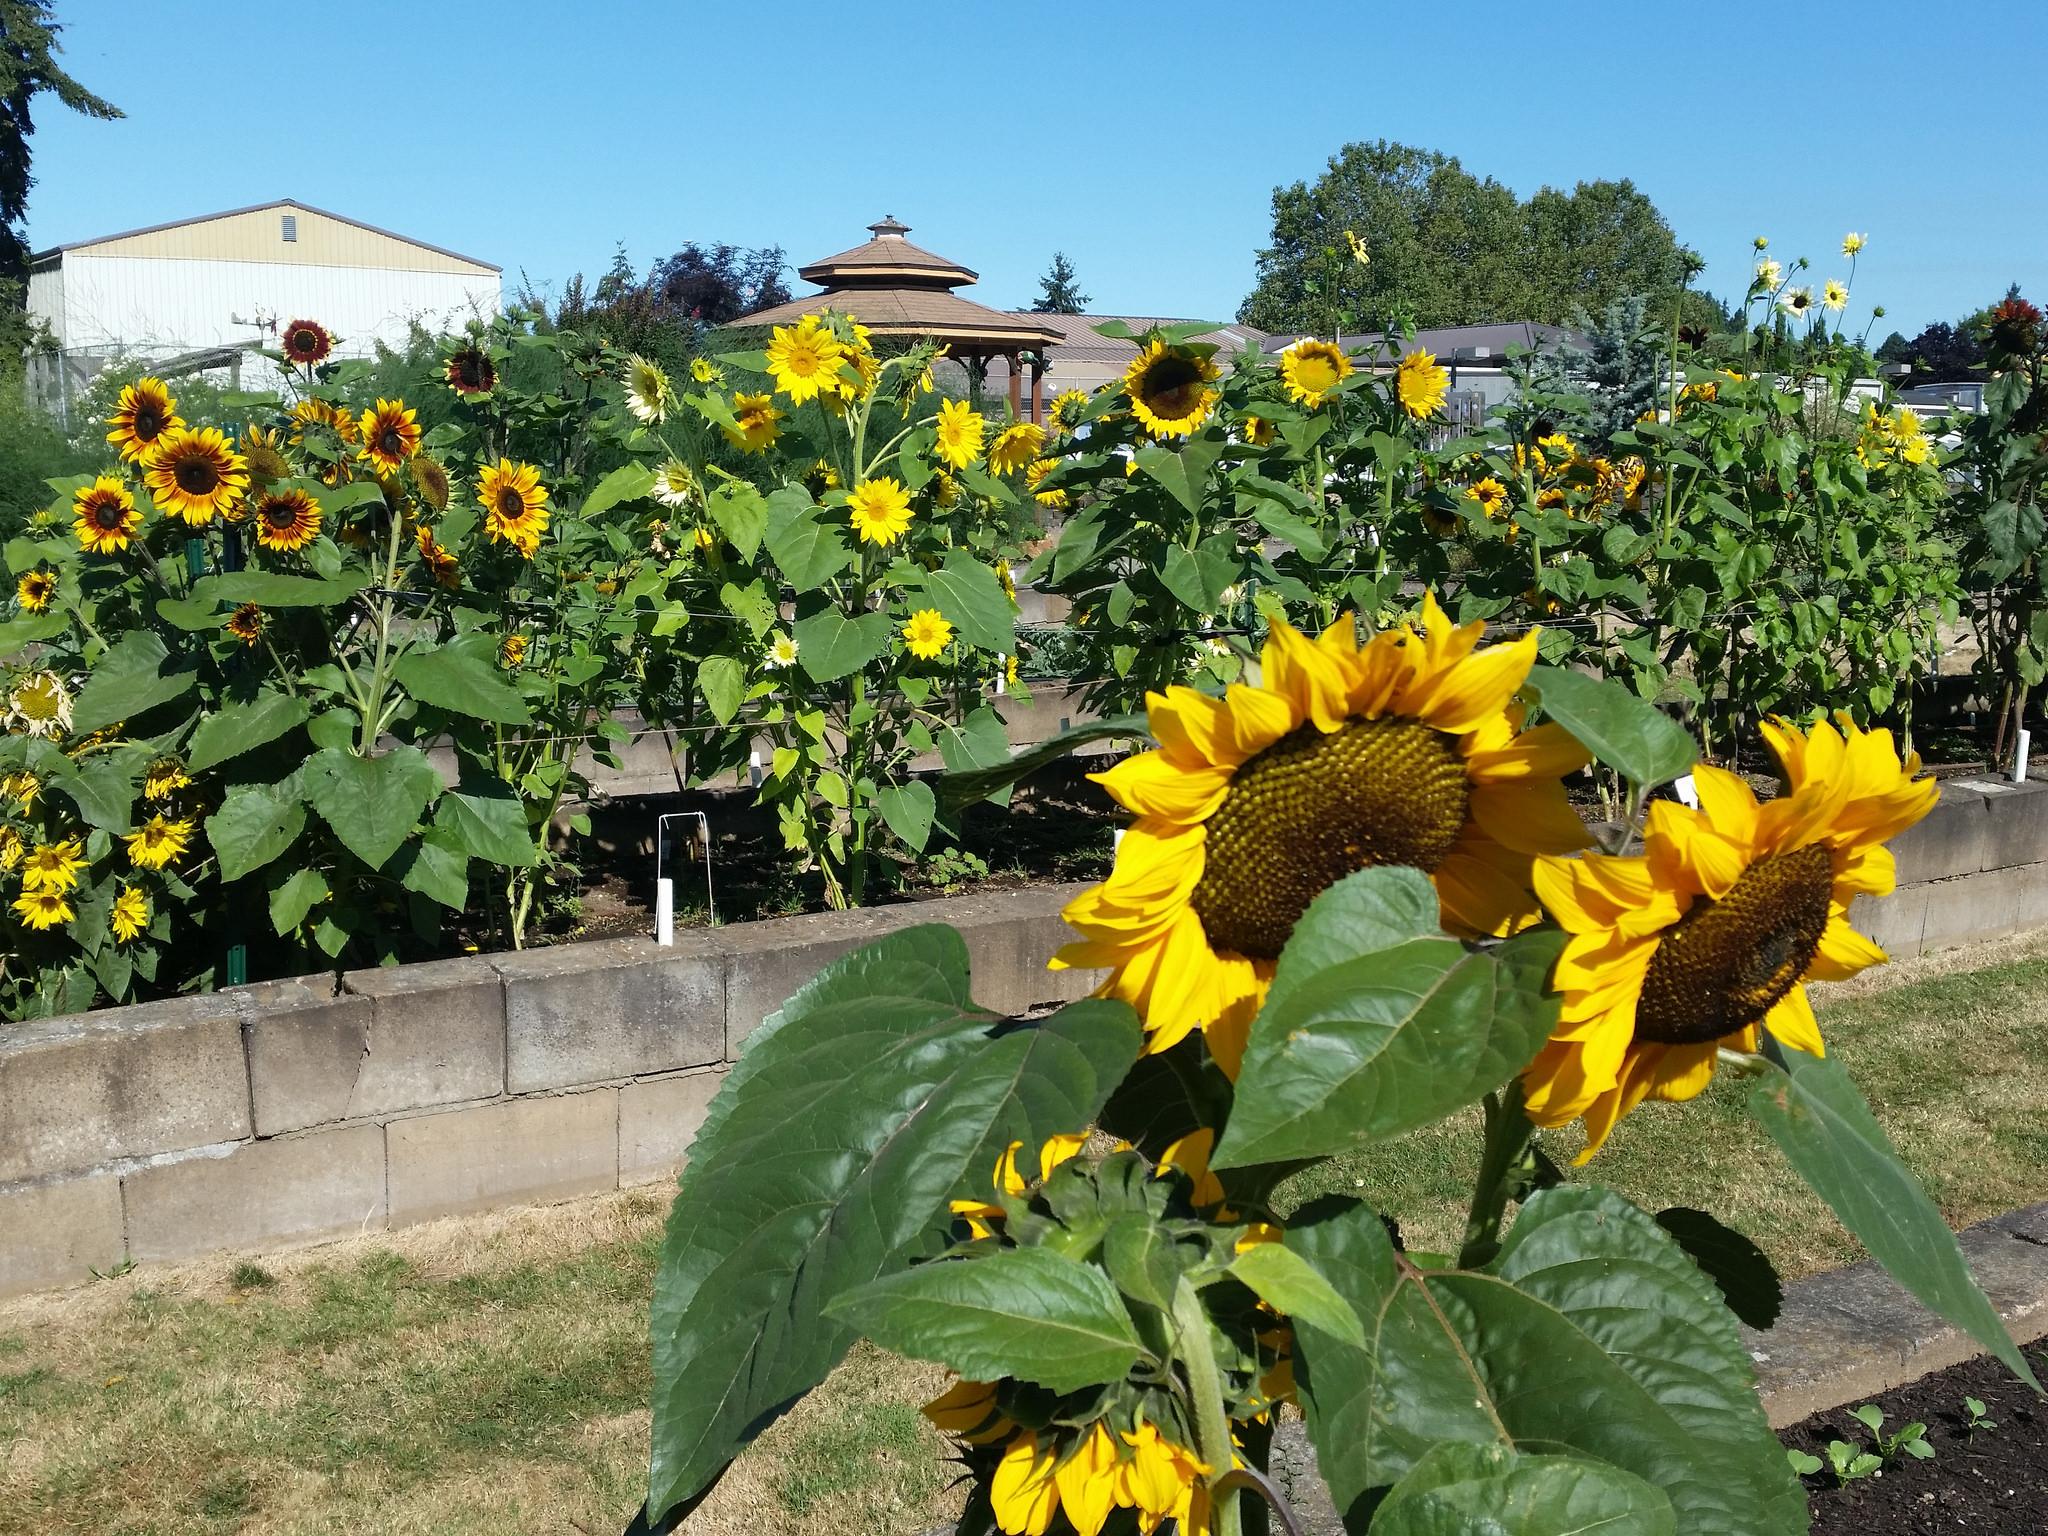 Sunflowers burst onto scene with new personalities